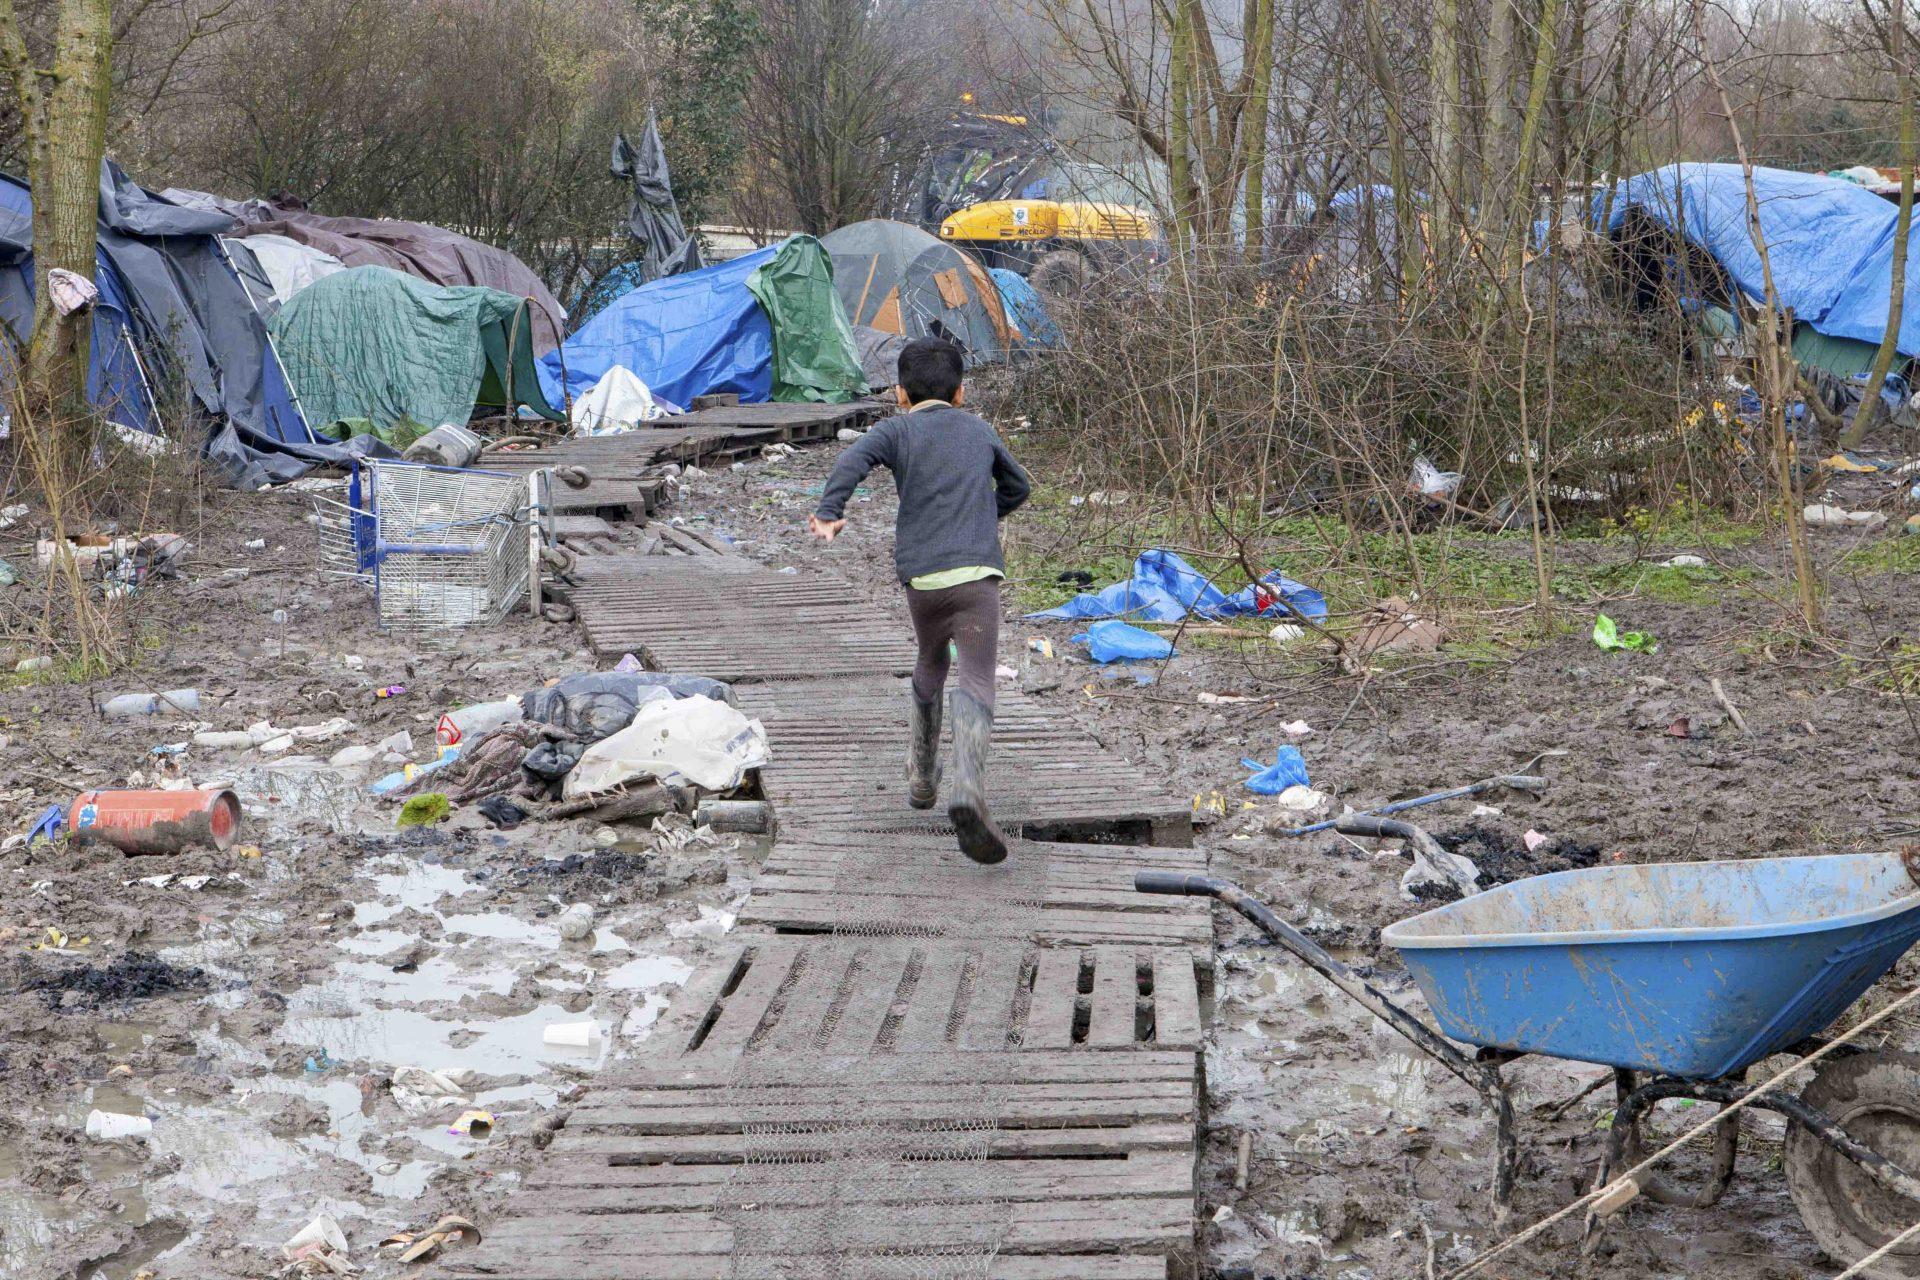 Camp De Réfugiés de Grande-Synthe